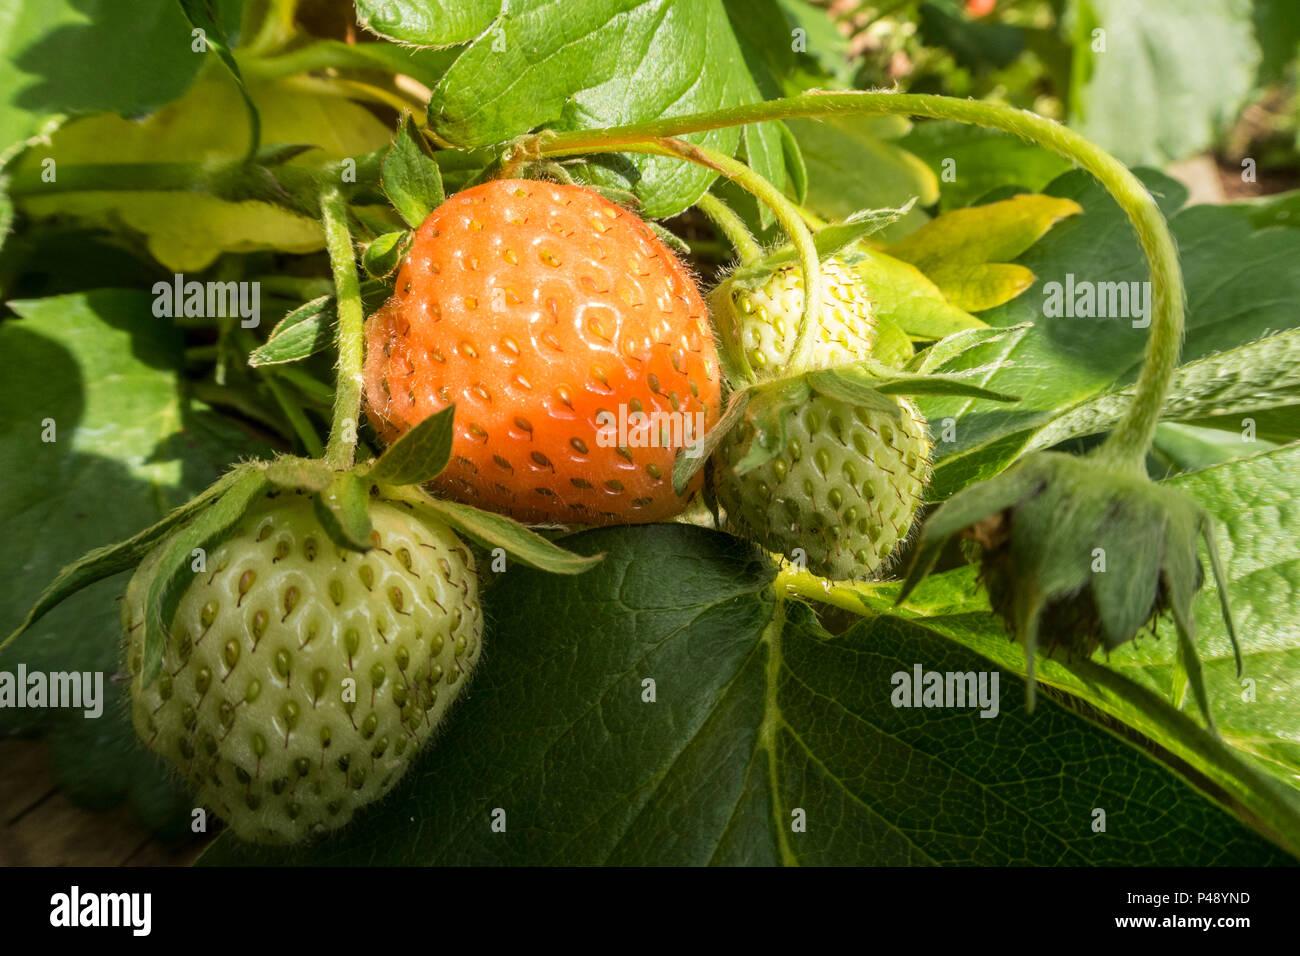 Strawberry Cambridge Favourite, fragaria x ananassa, strawberries growing on the plant - Stock Image